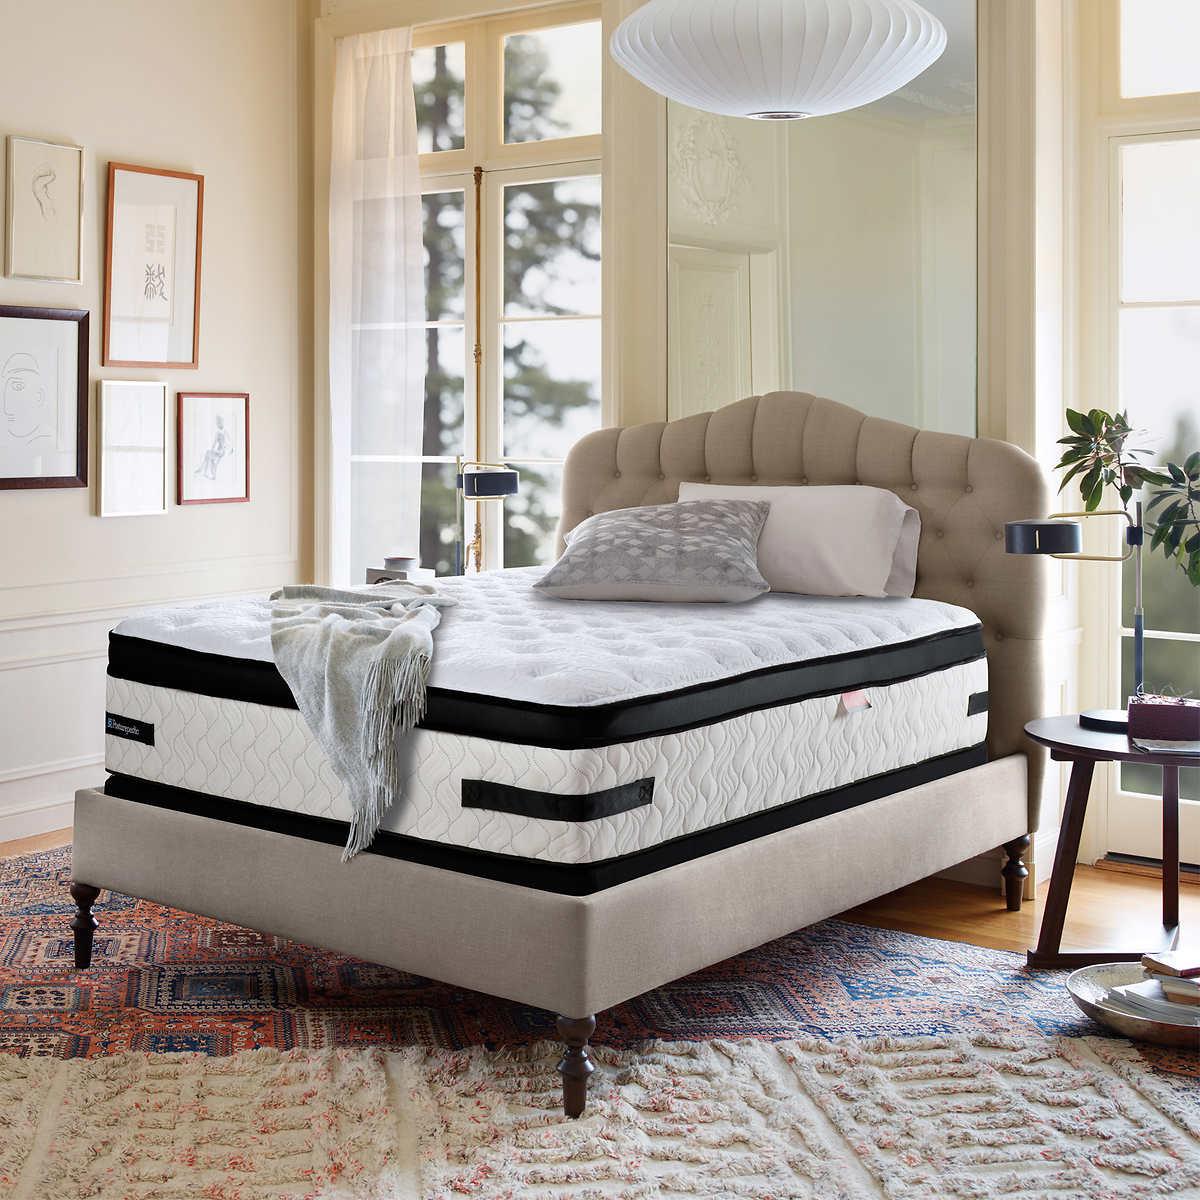 Sealy® Posturepedic® Proback™ Poitier Queen Mattress or Set